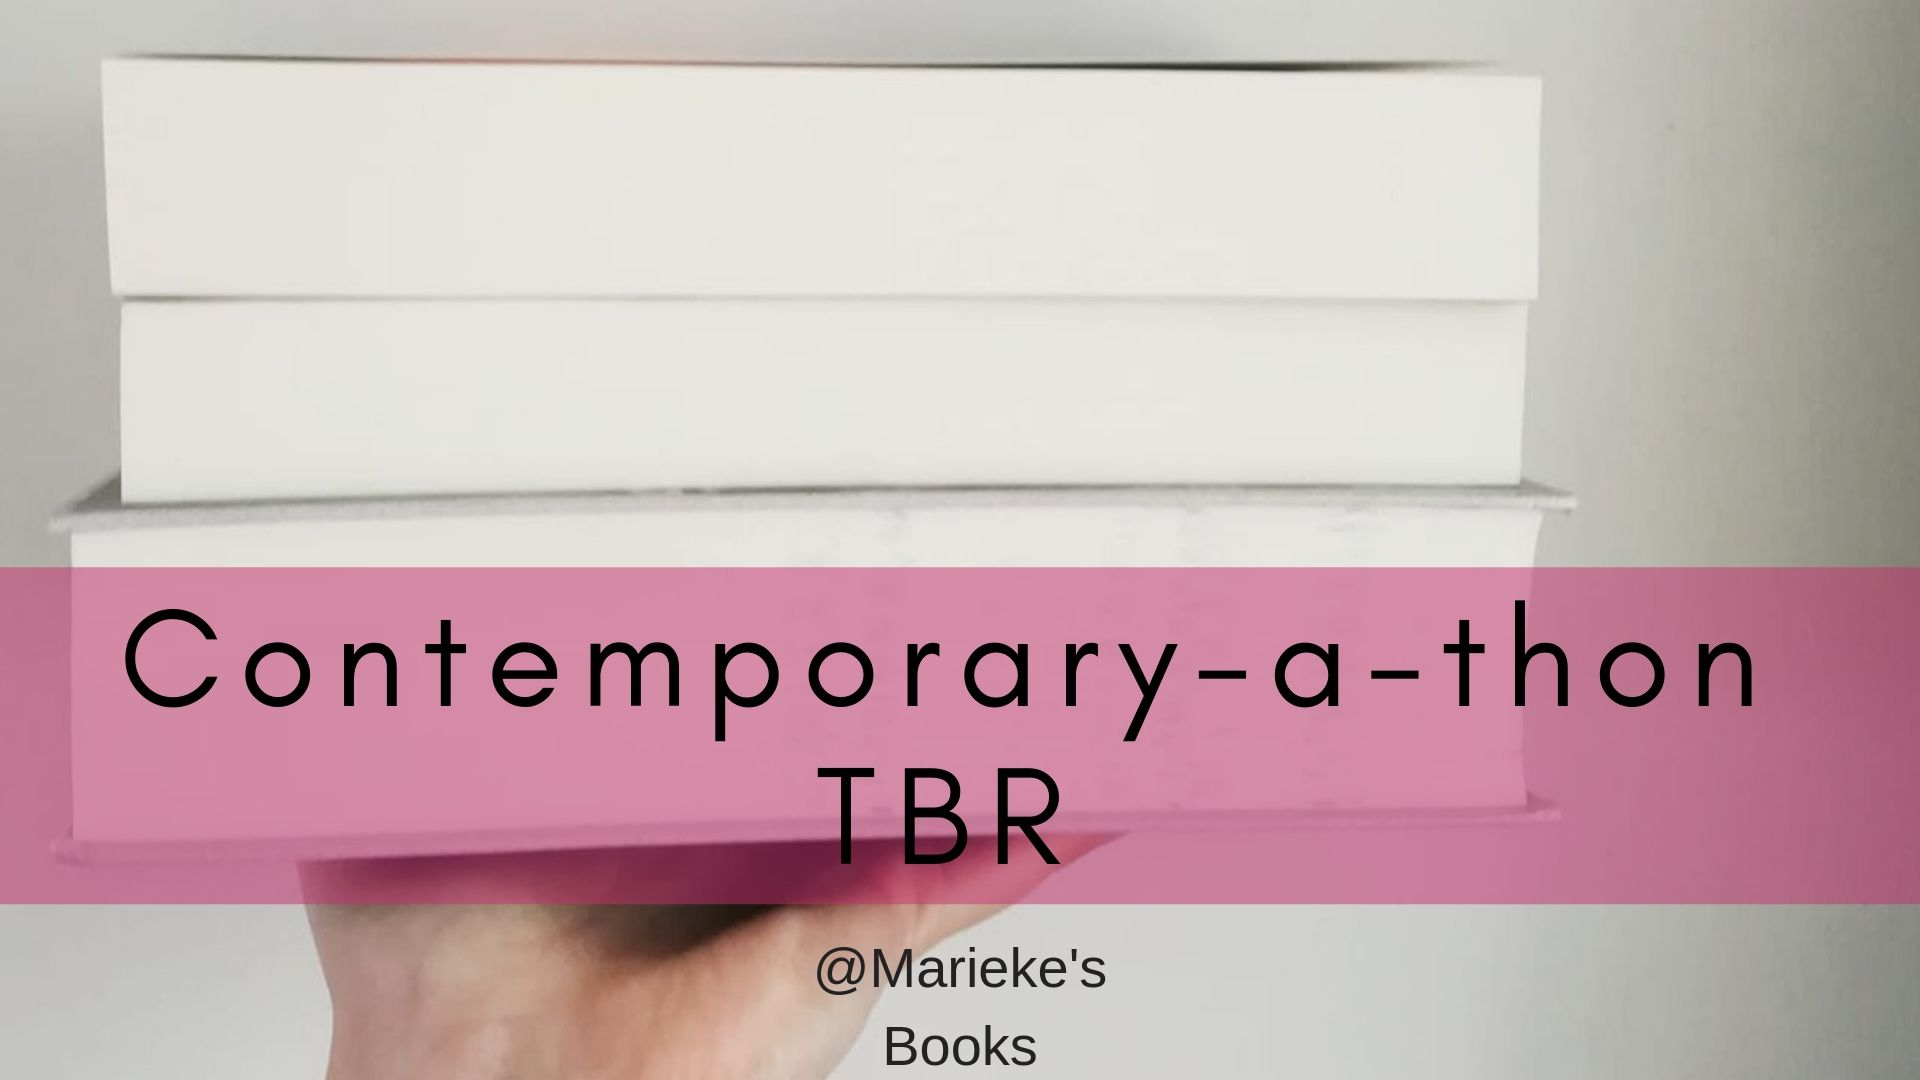 Contemporary-a-thon TBR | Marieke's Books